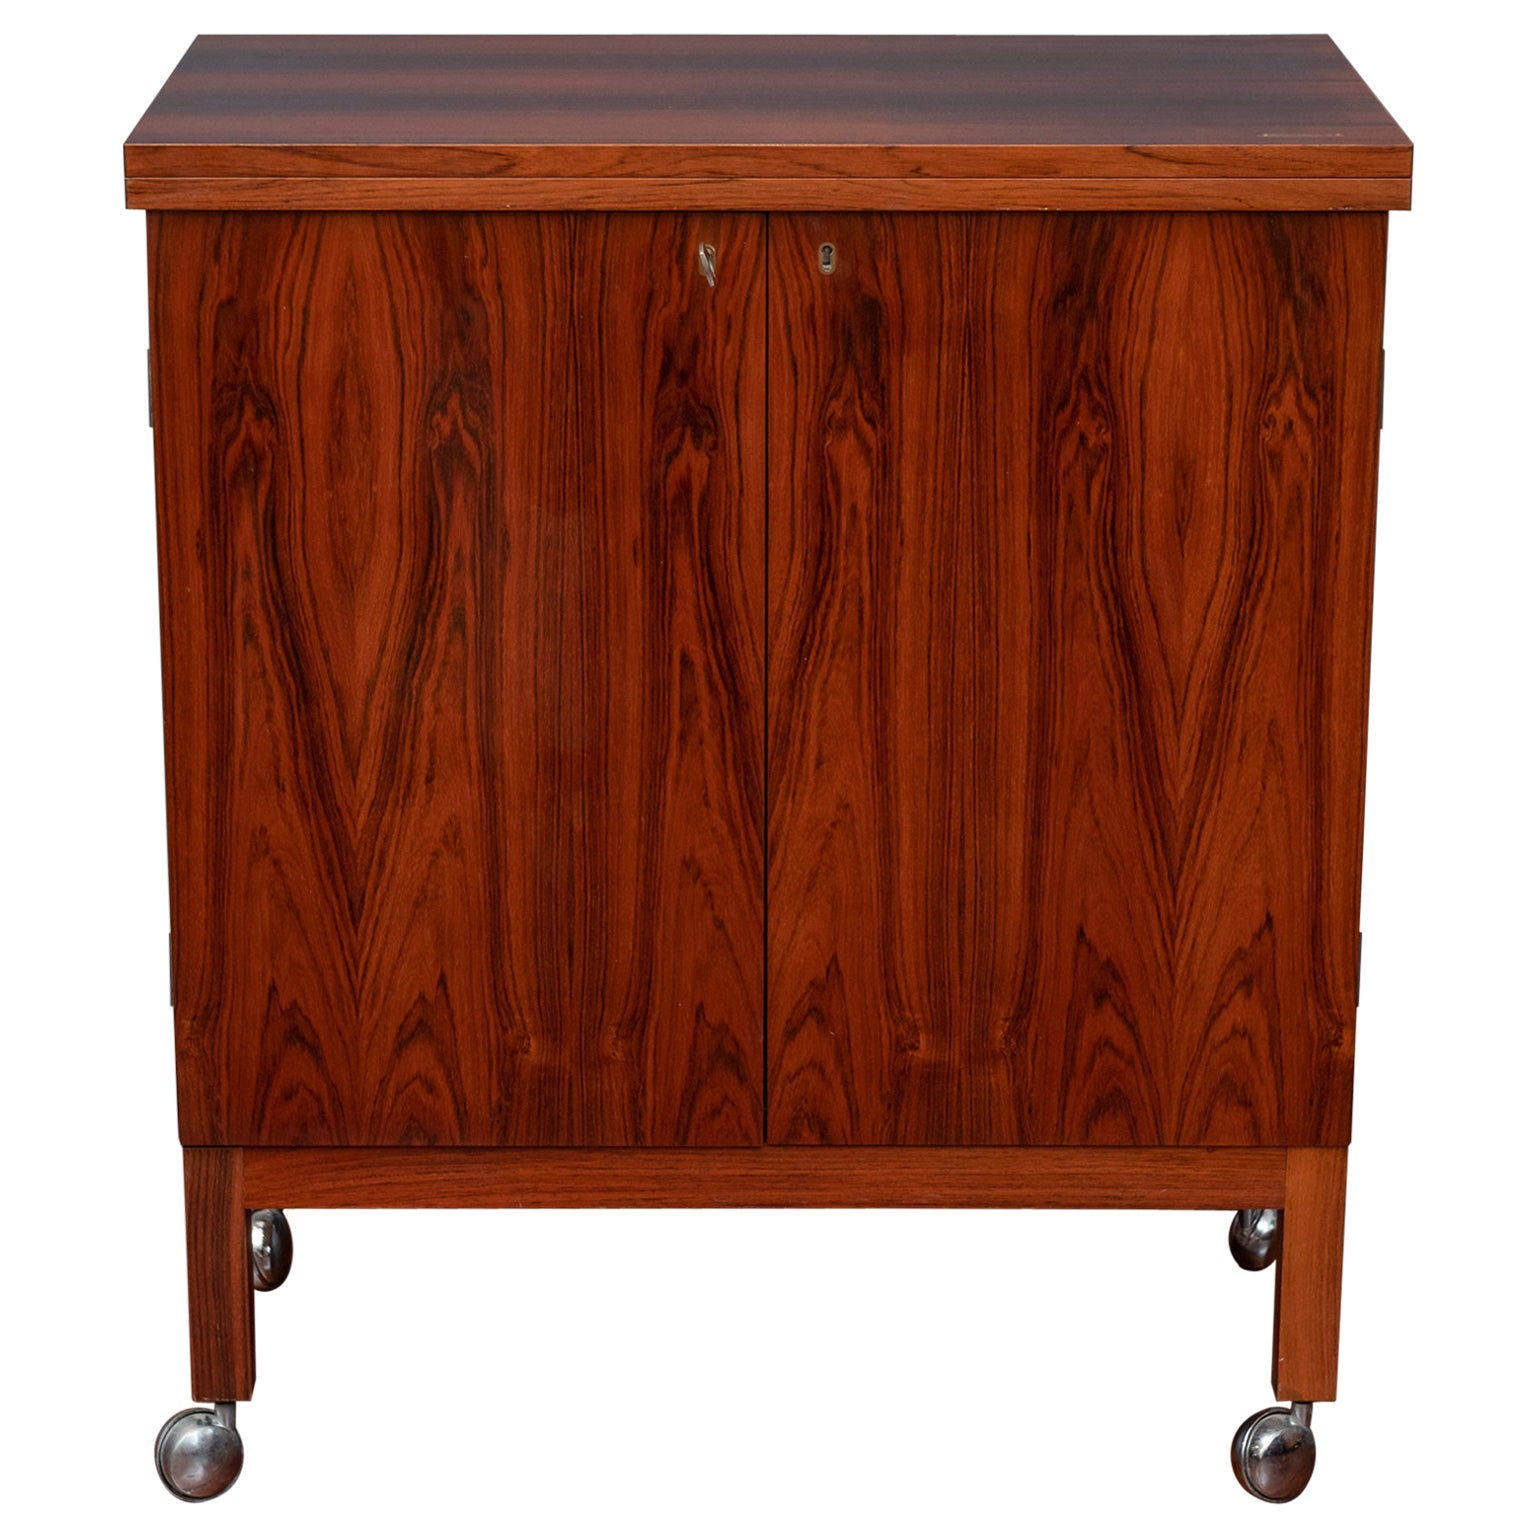 Scandinavian Modern Rosewood Bar Cabinet by Torbjorn Afdal for Bruskbo